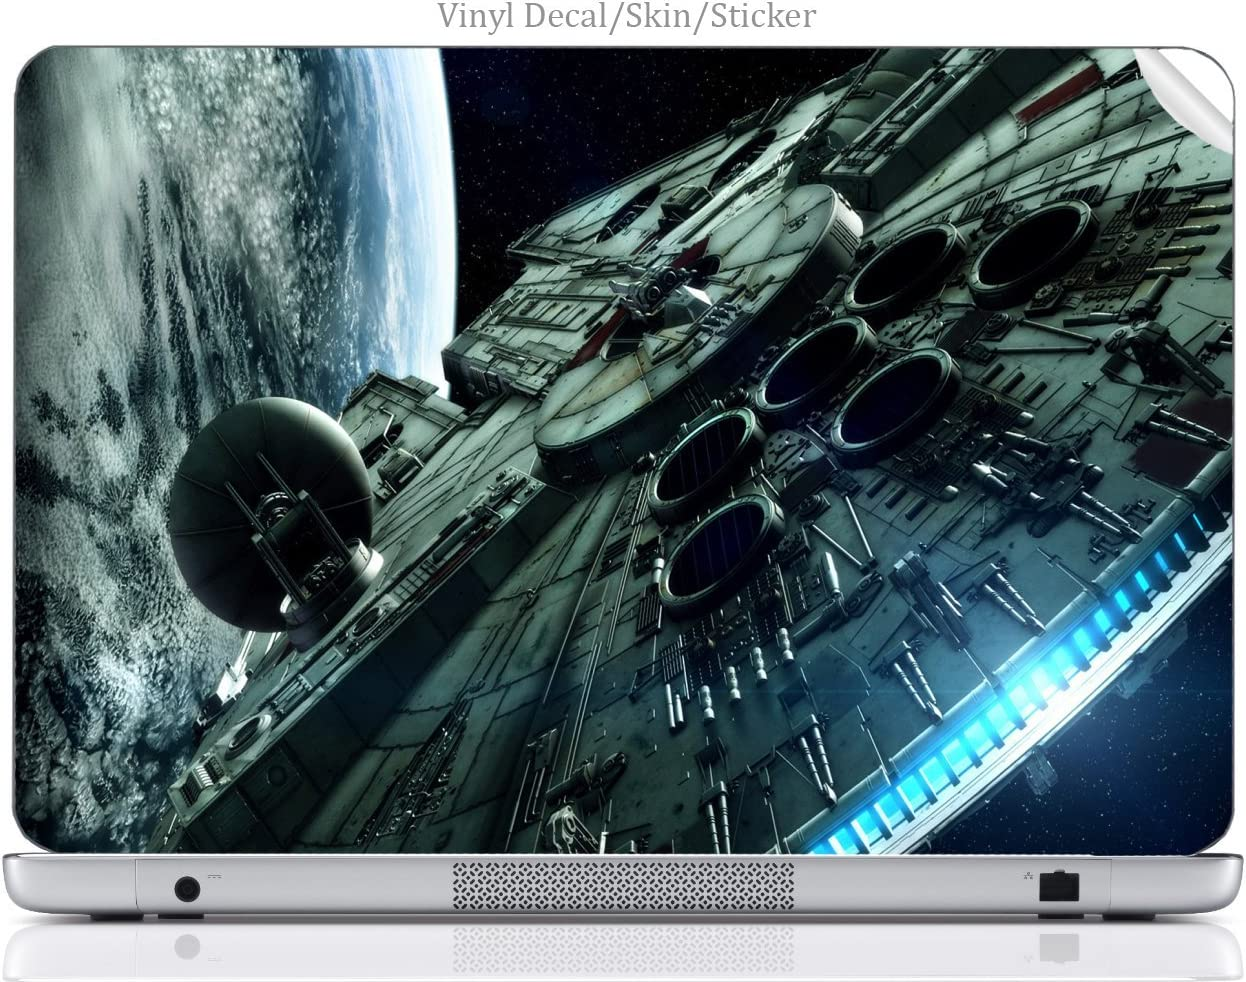 Laptop VINYL DECAL Sticker Skin Print Space Station fits 15.6